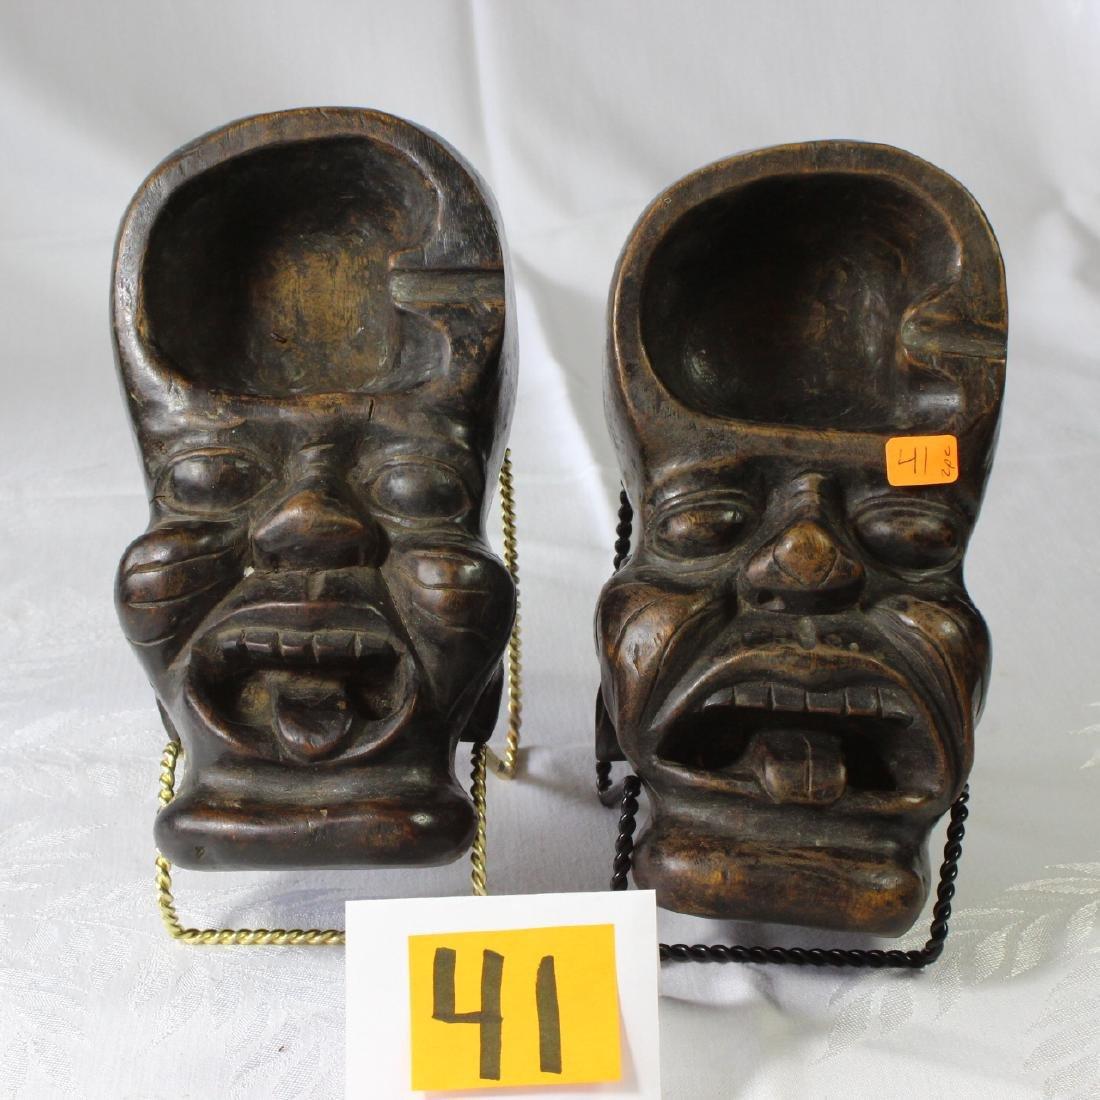 2 Tribal Folk Art Carved Face Ashtrays Indonesia